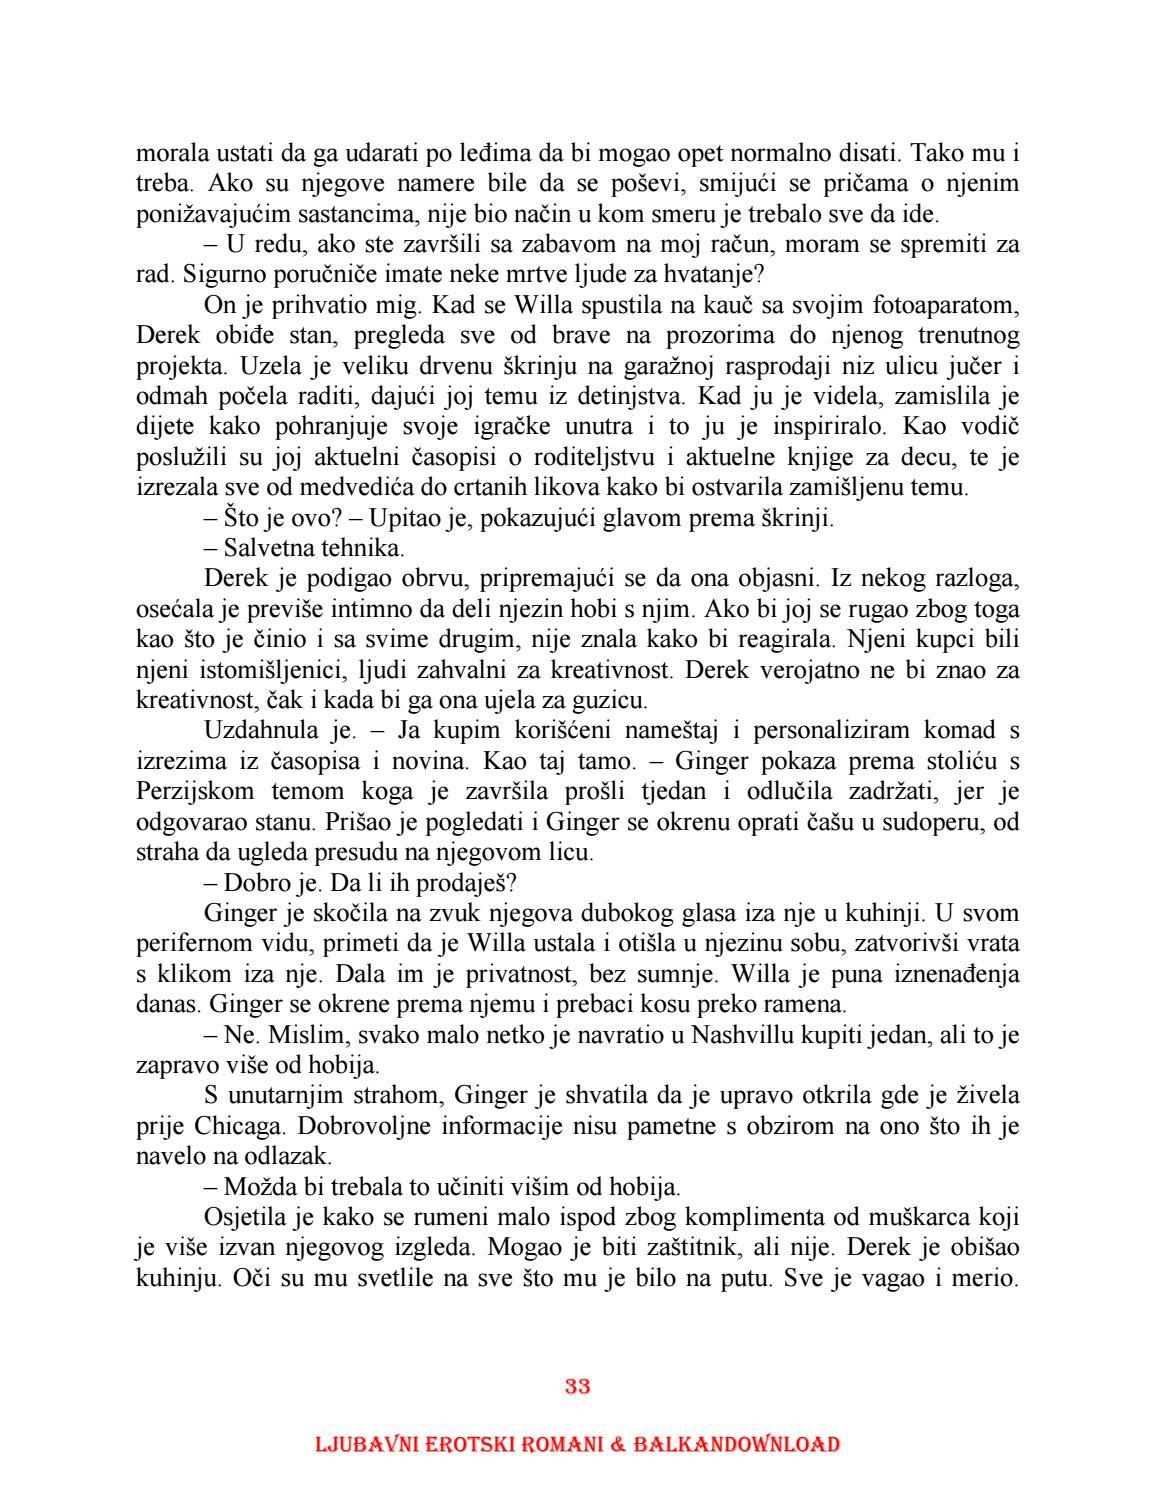 Novinarnica romani ljubavni vikend images.dujour.com